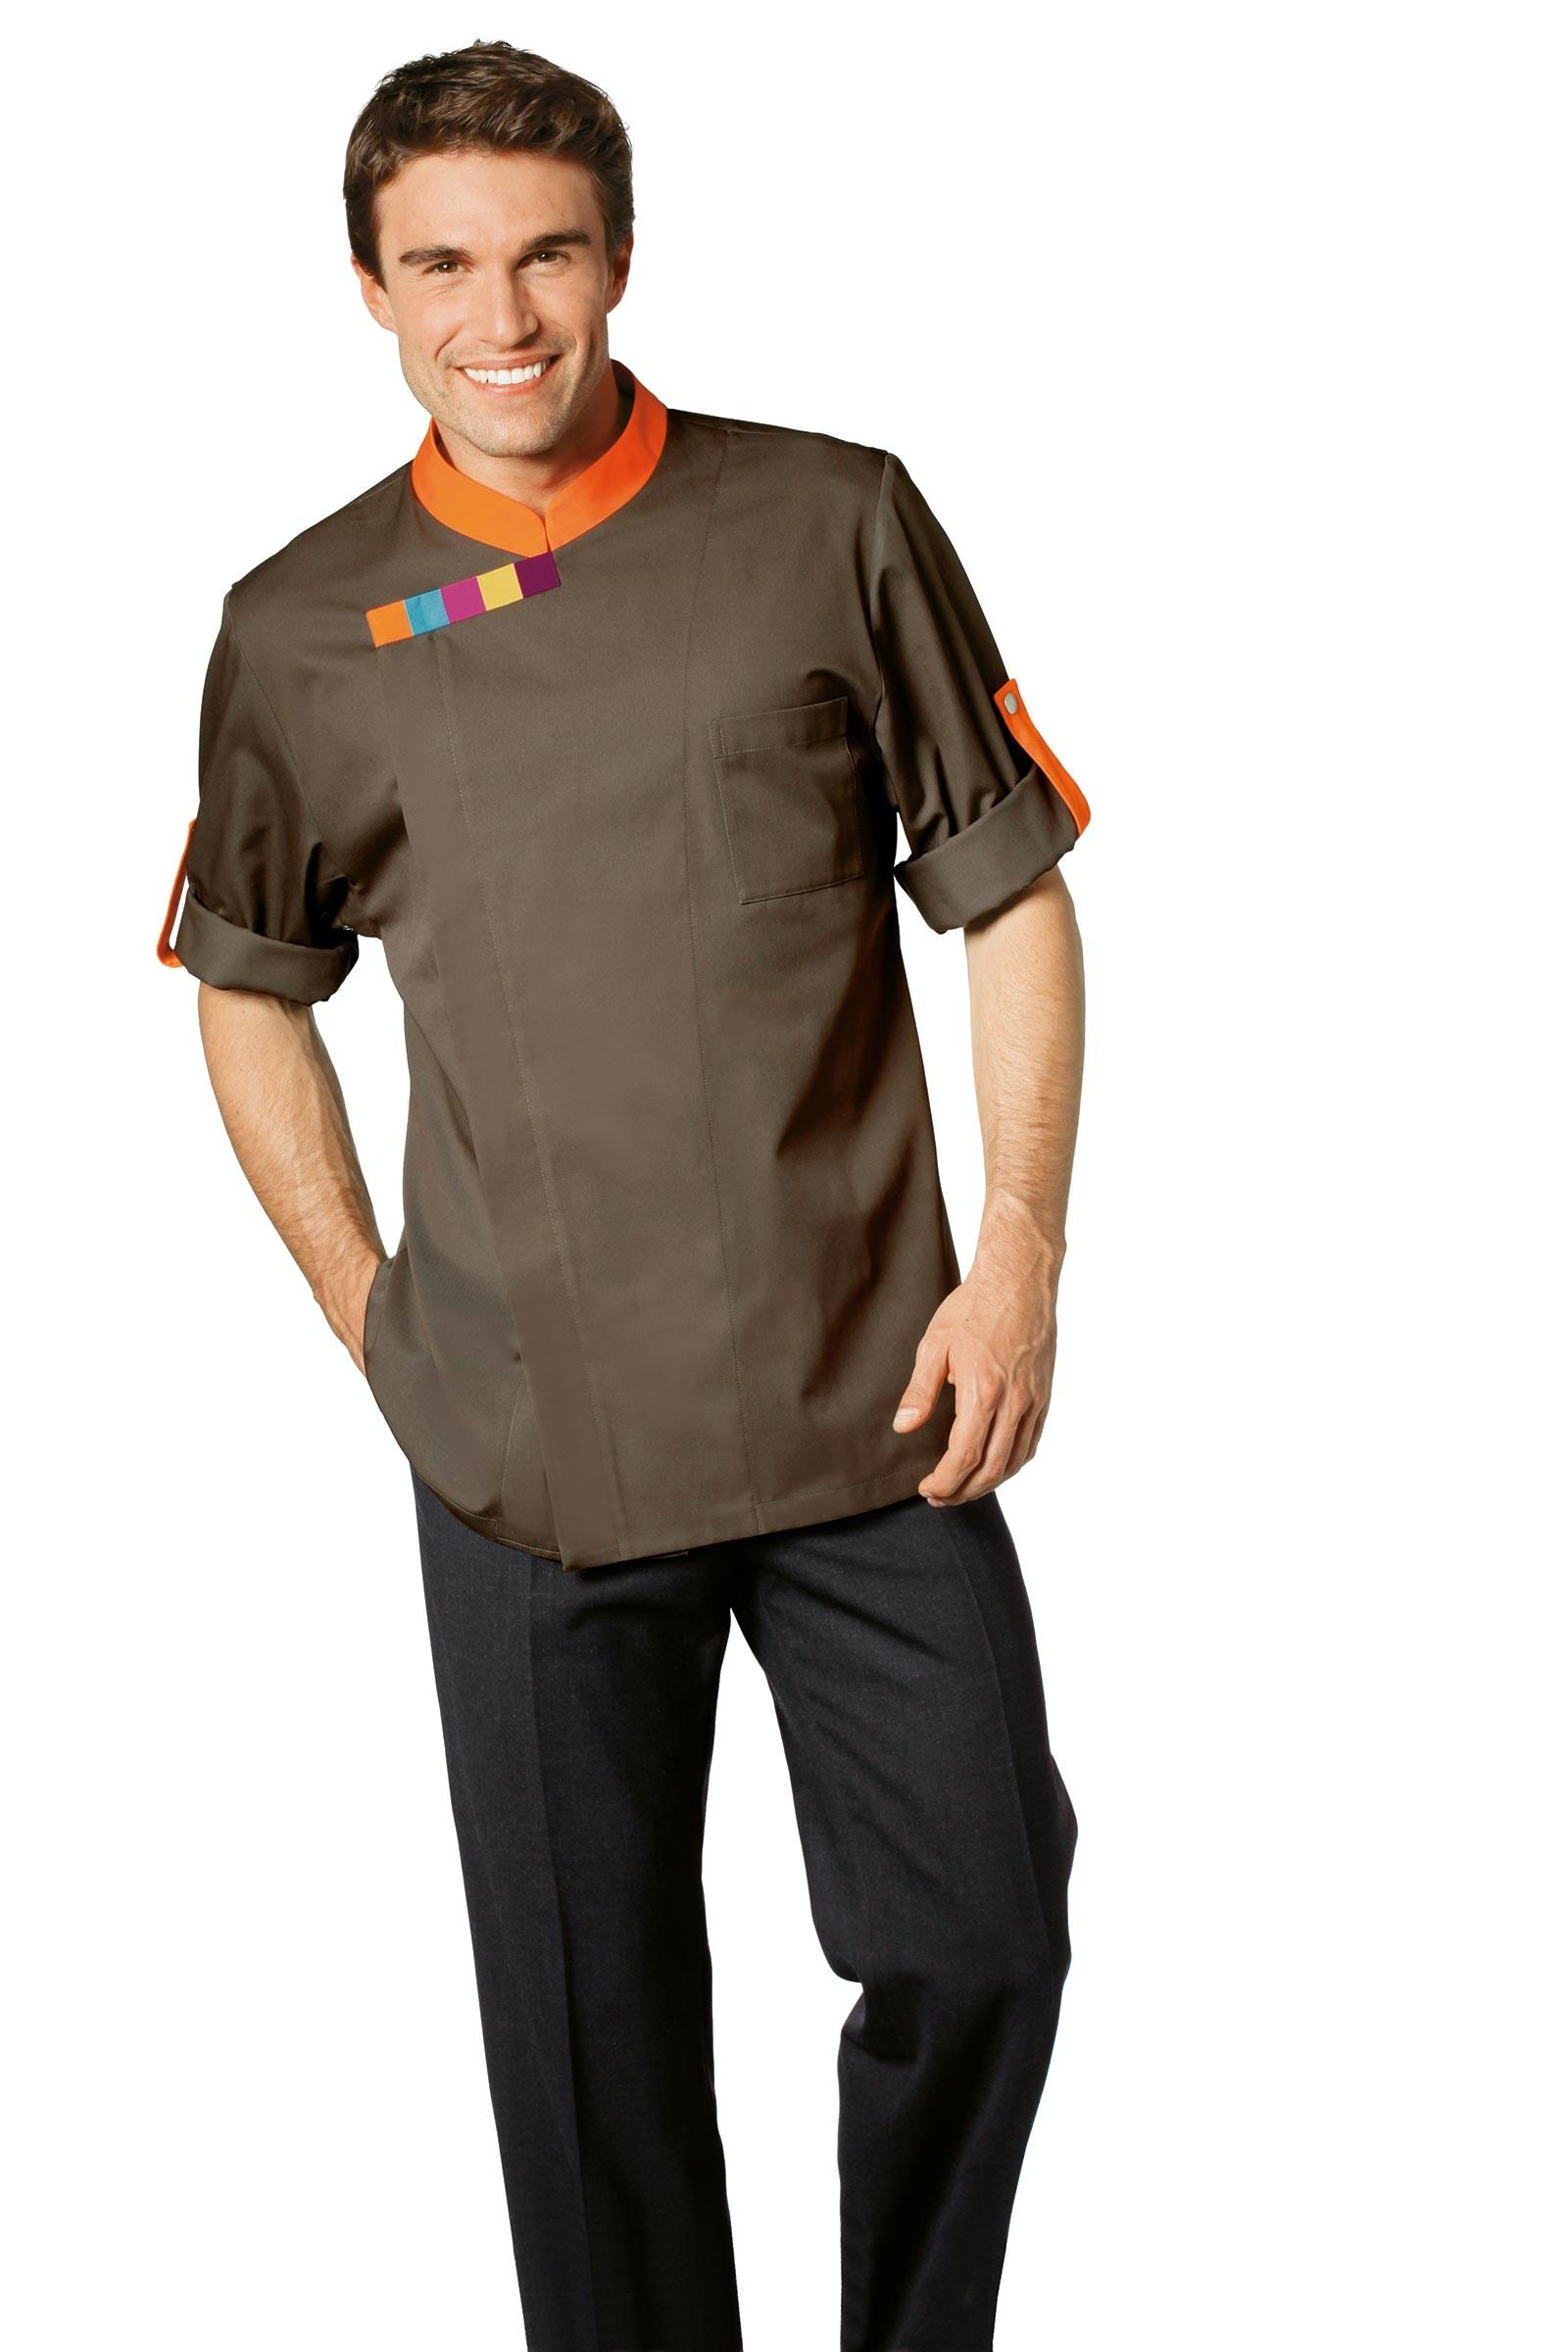 Veste cuisine ebay veste cuisine femme et homme veste de for Veste de cuisine mof